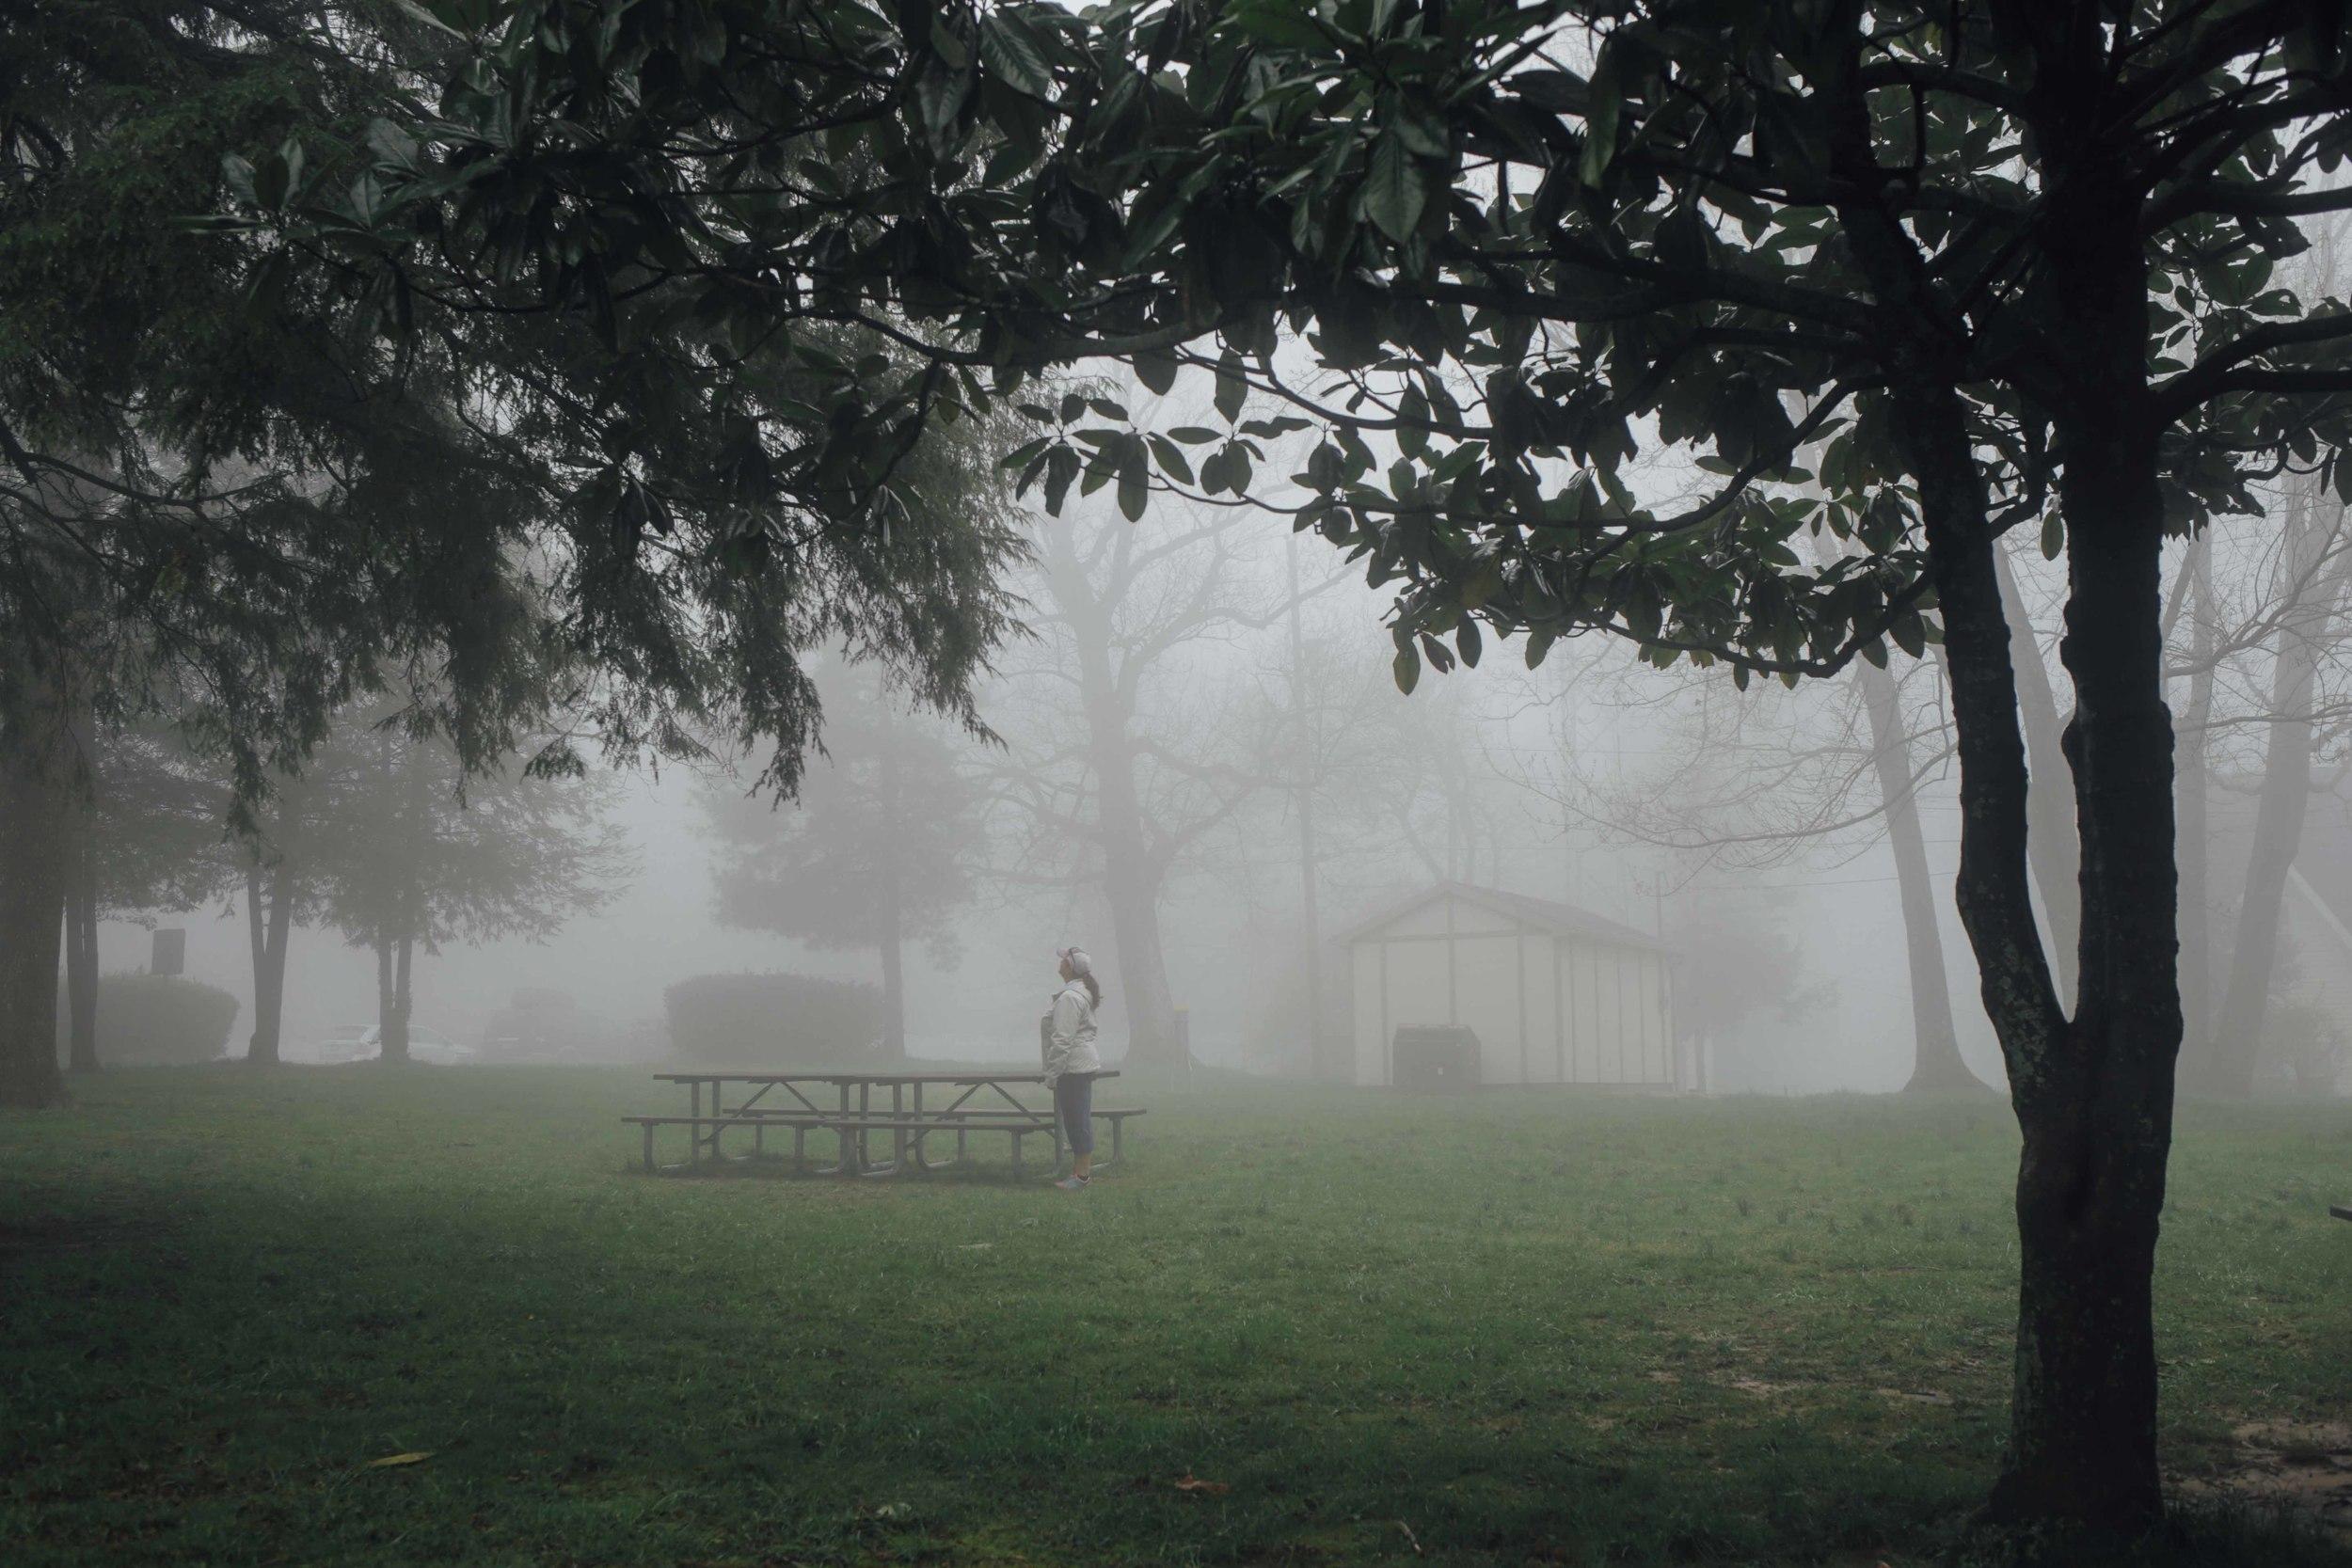 chattanooga-3.jpg